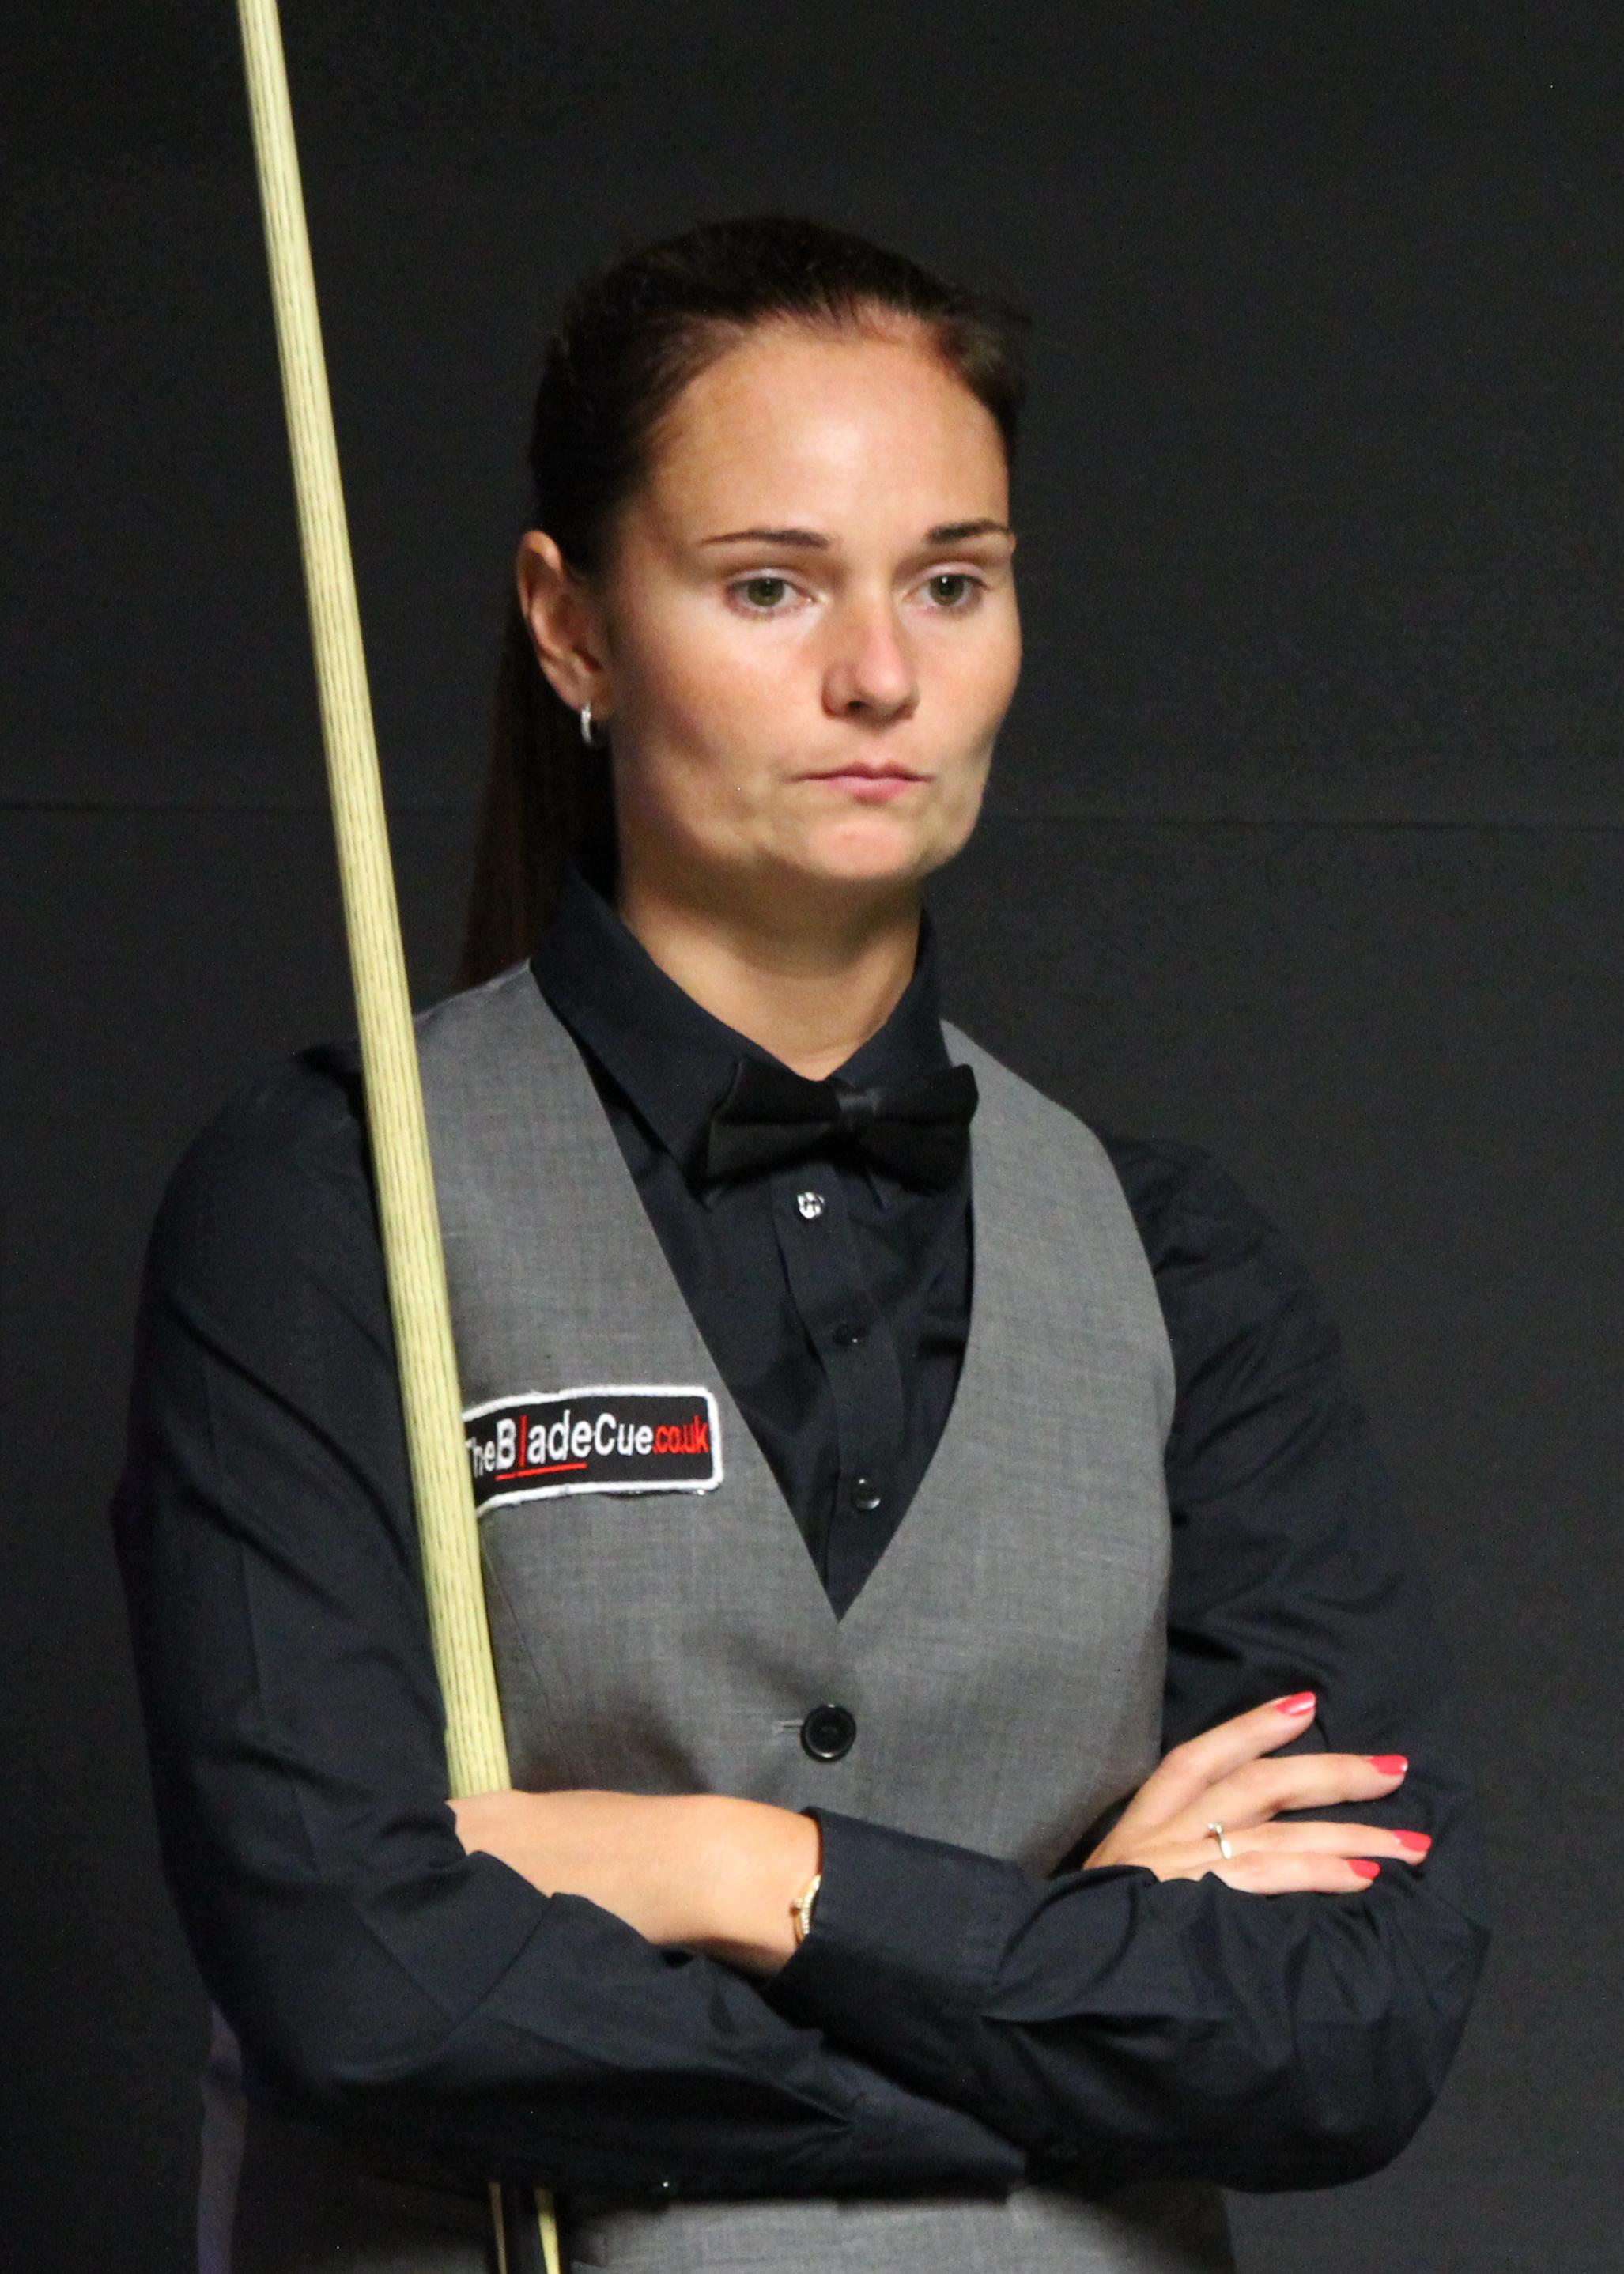 Reanne Evans - Wikipedia